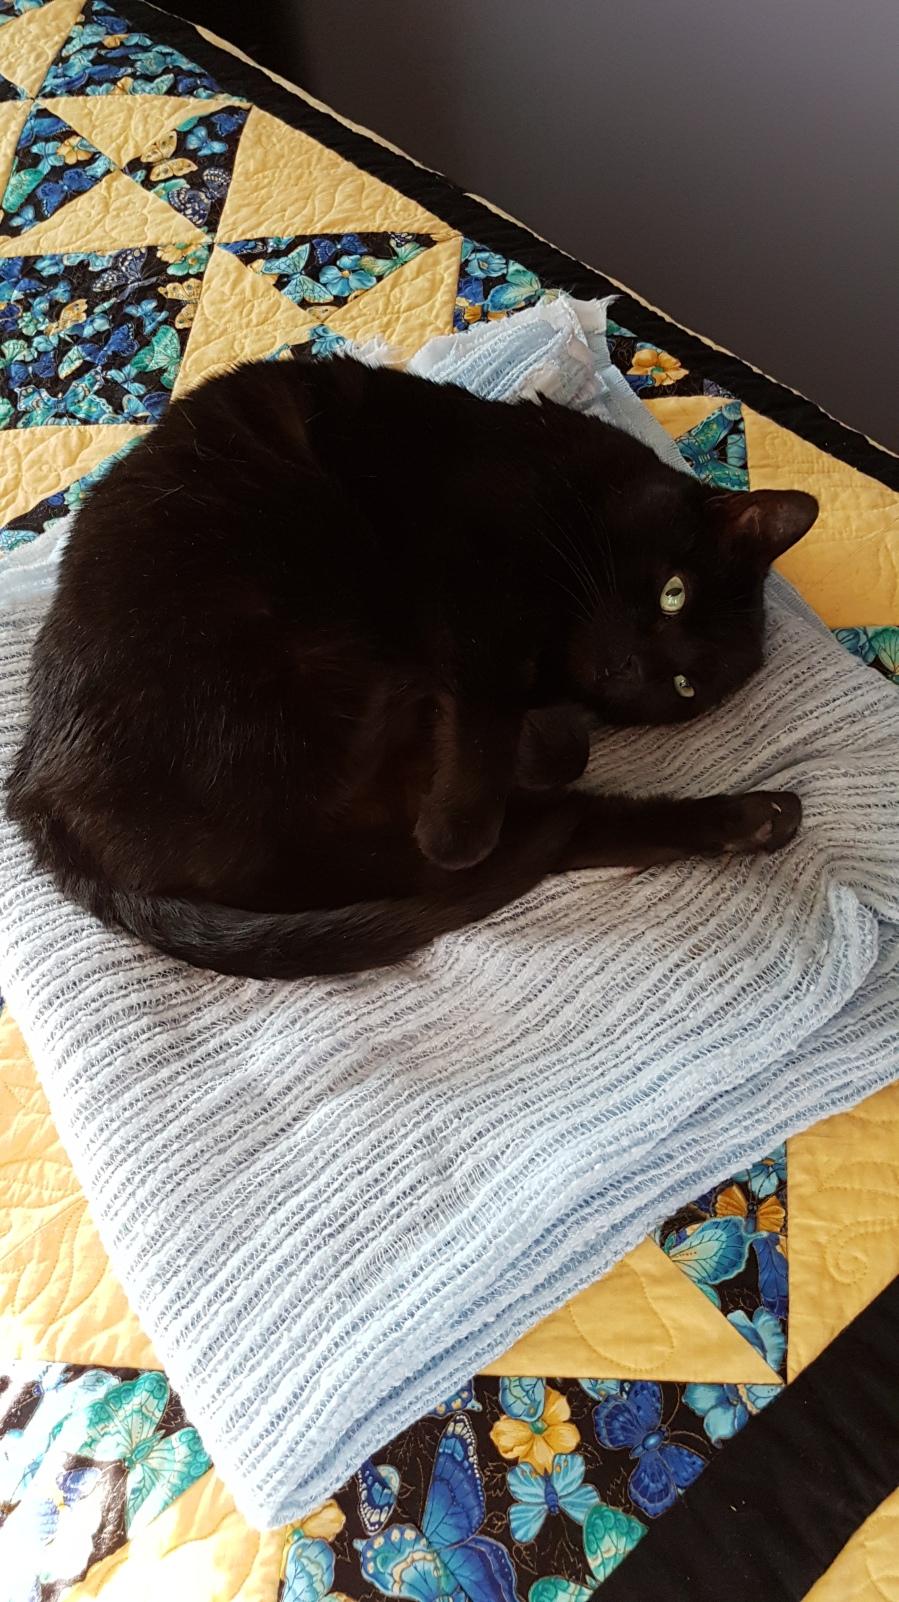 Sasha curled up on a blanket